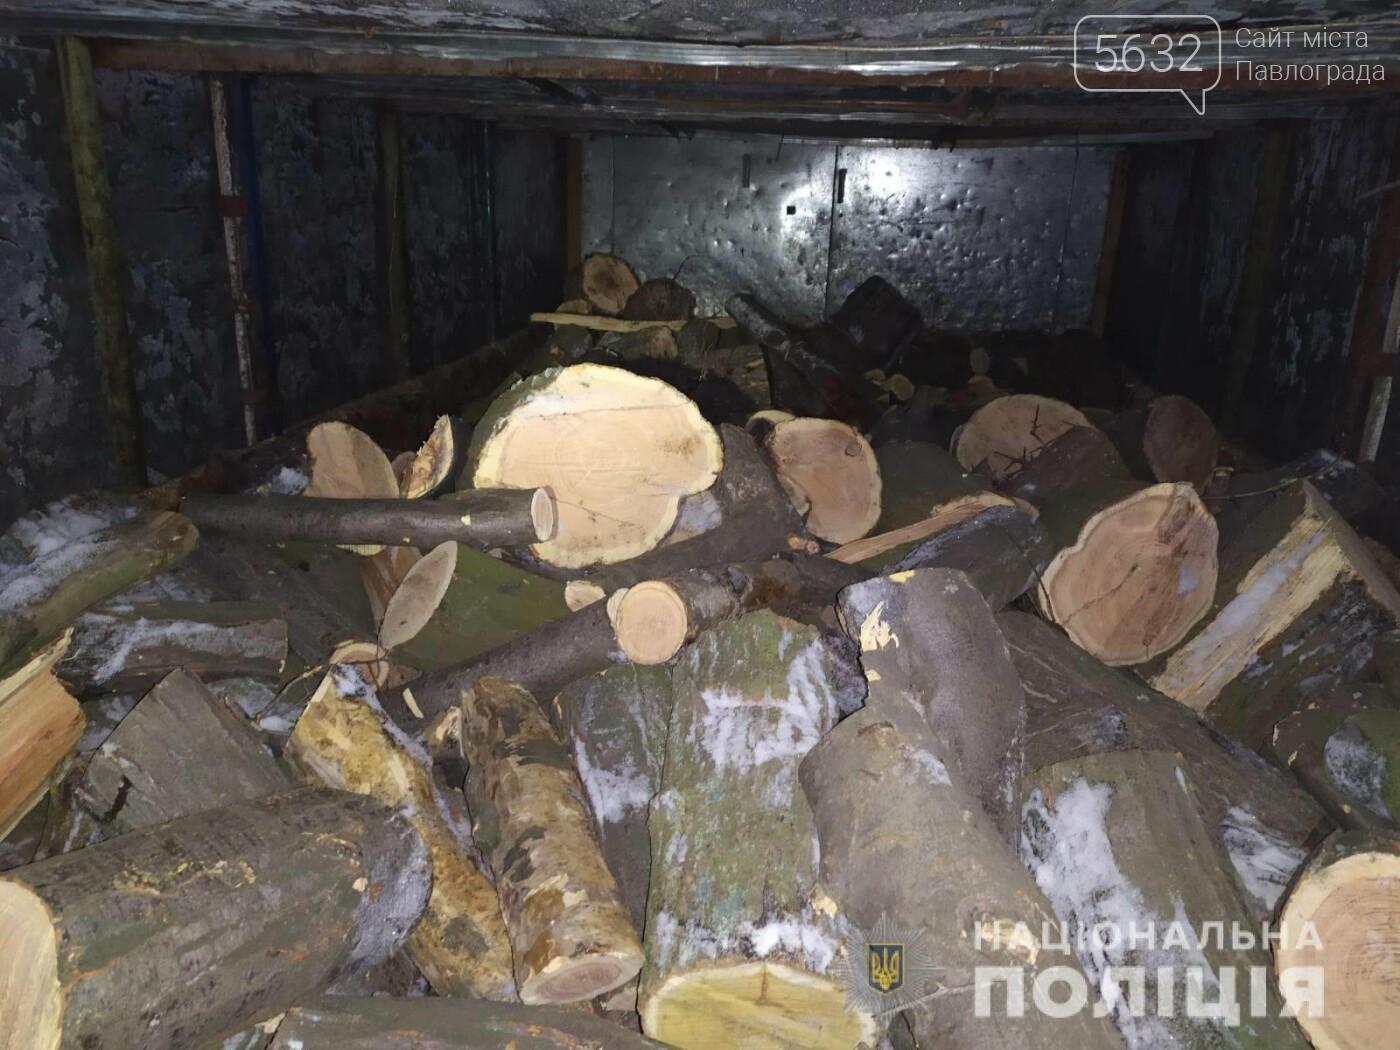 На Павлоградщине задержали «чёрного лесоруба», фото-1